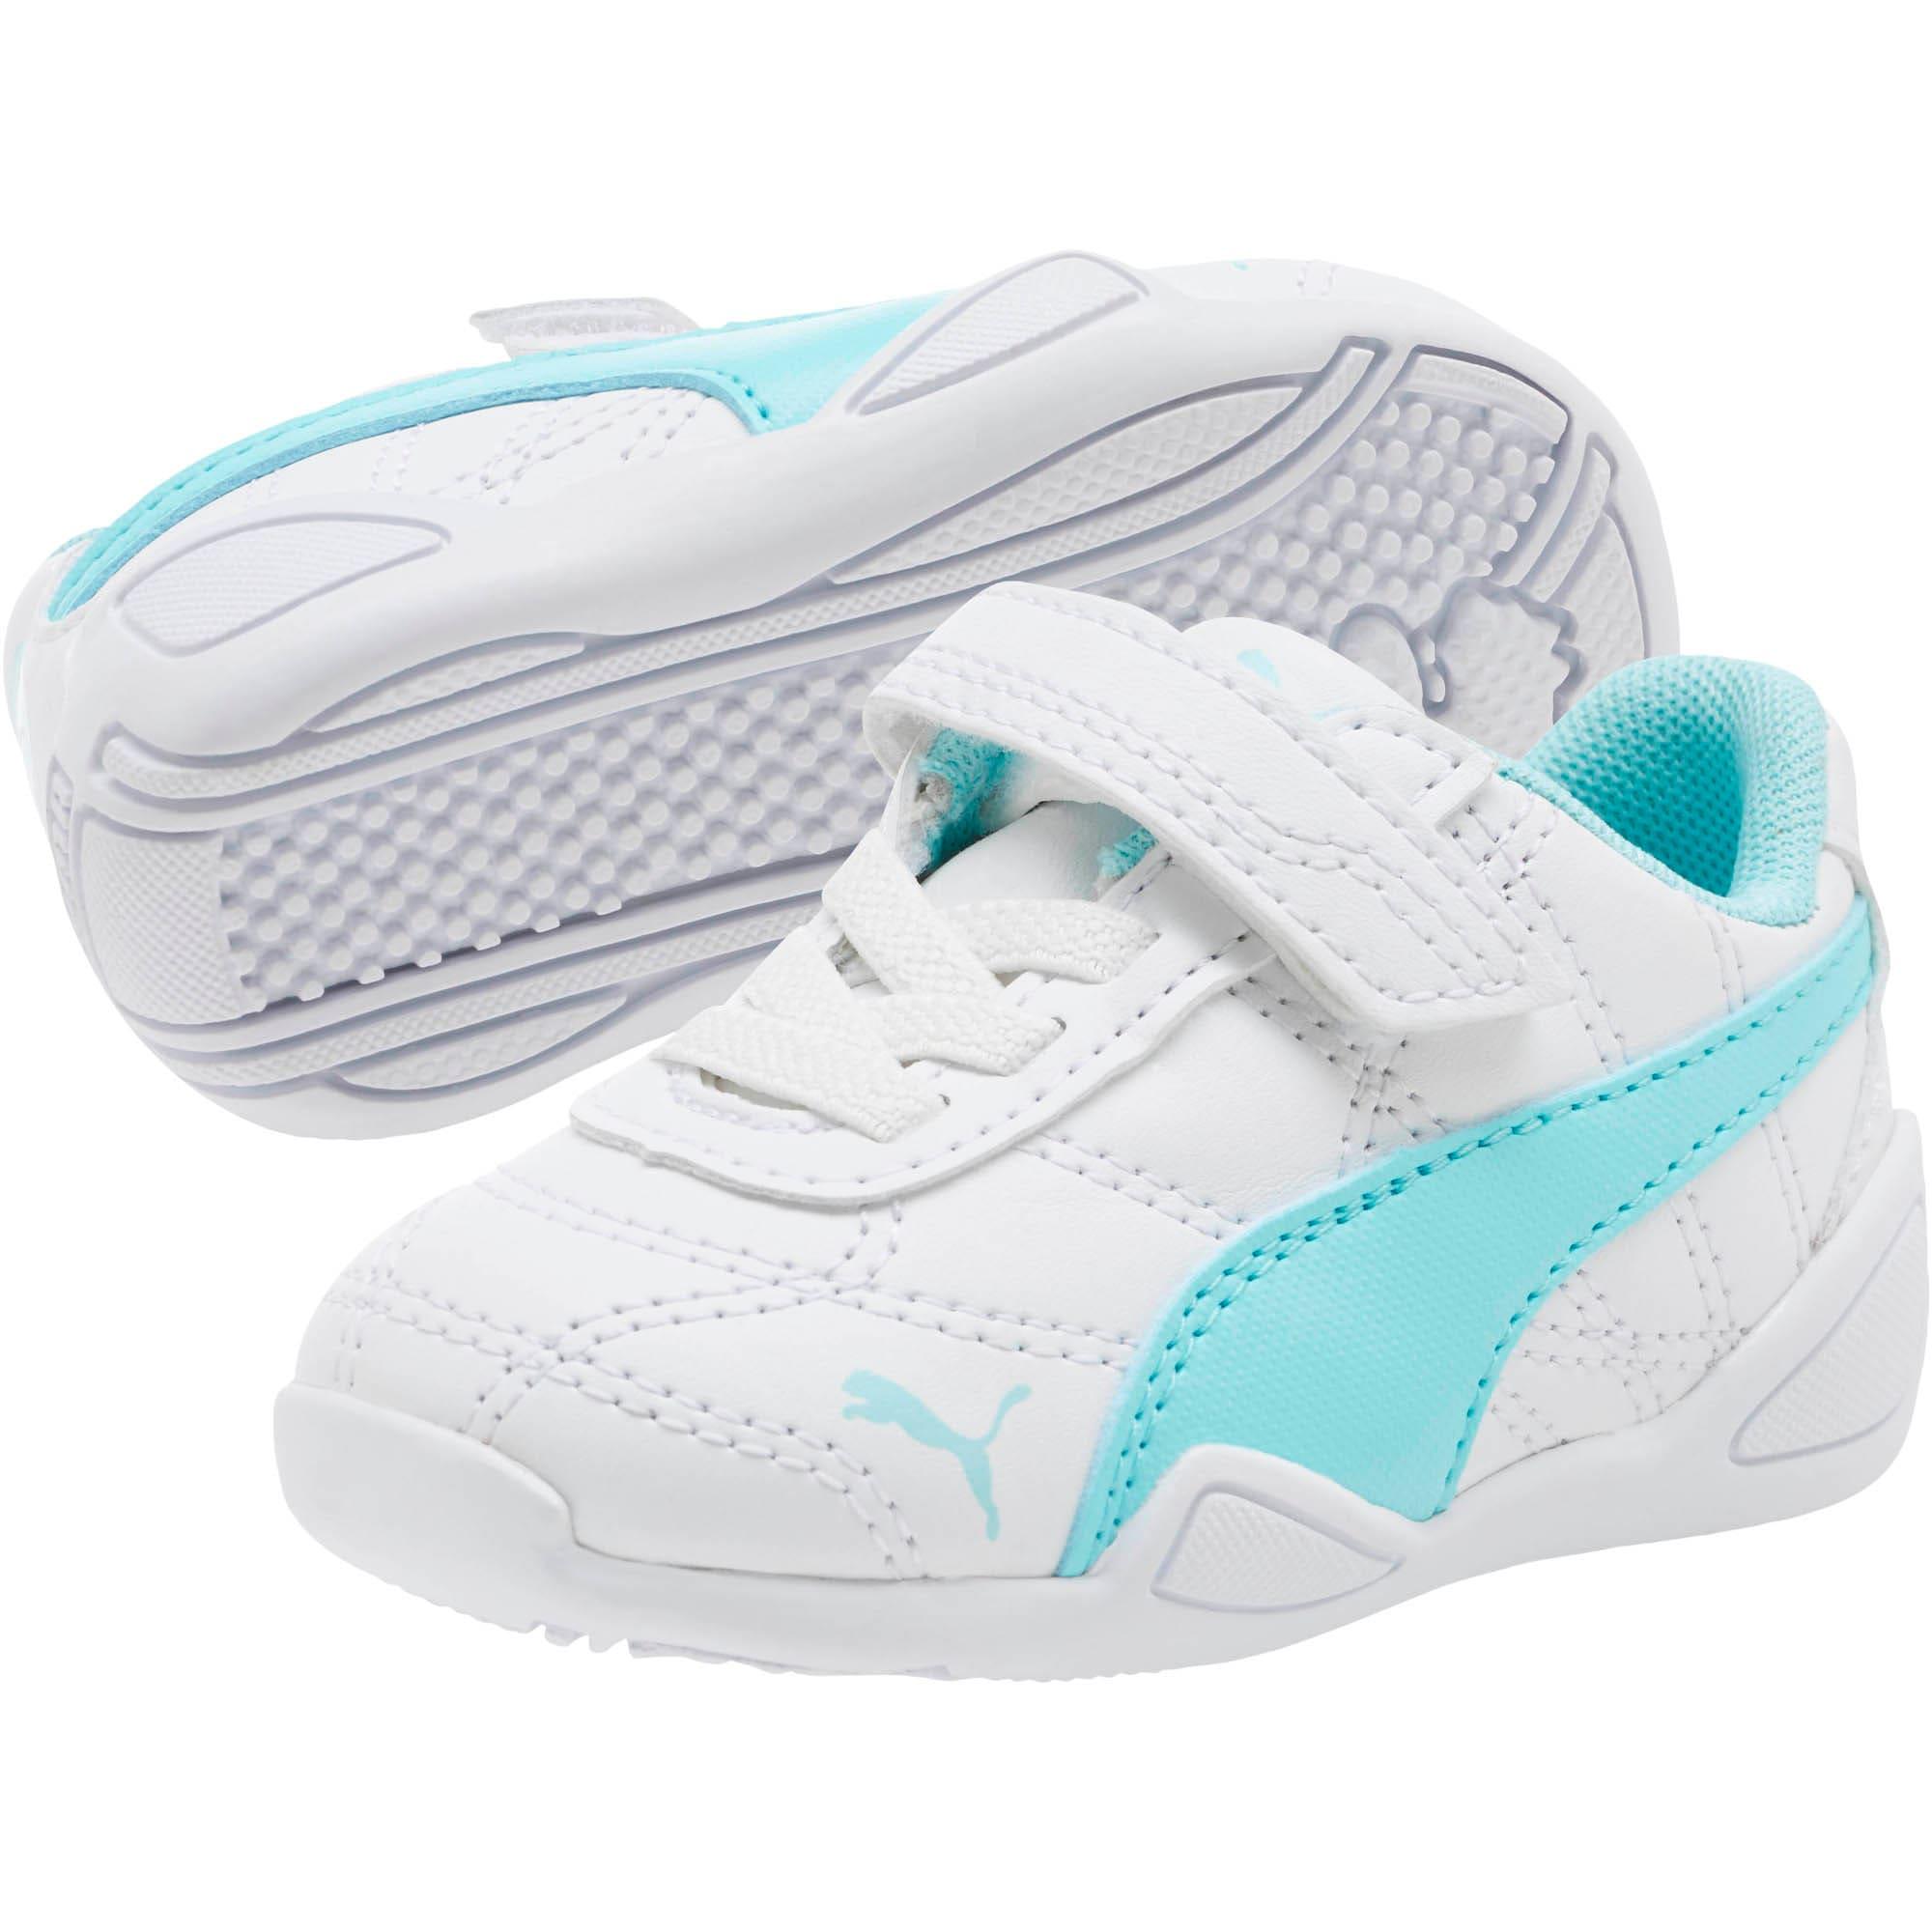 Thumbnail 2 of Tune Cat 3 AC Toddler Shoes, Puma White-Island Paradise, medium